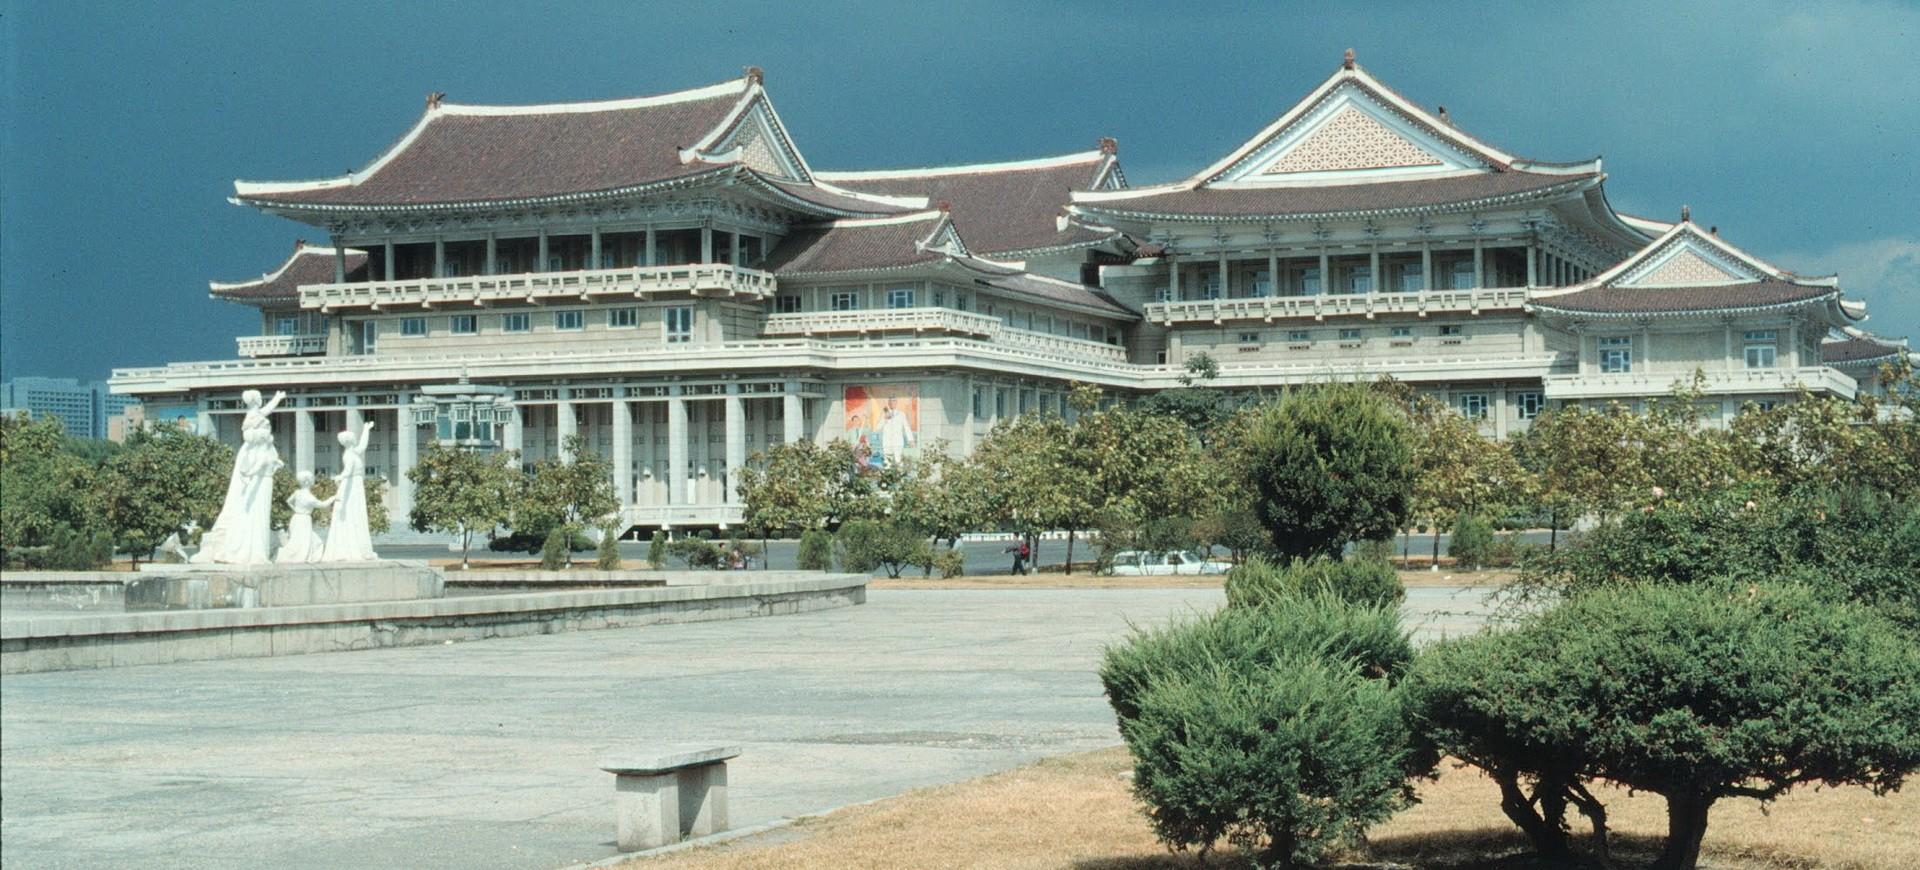 Pyongyang en Corée du Nord